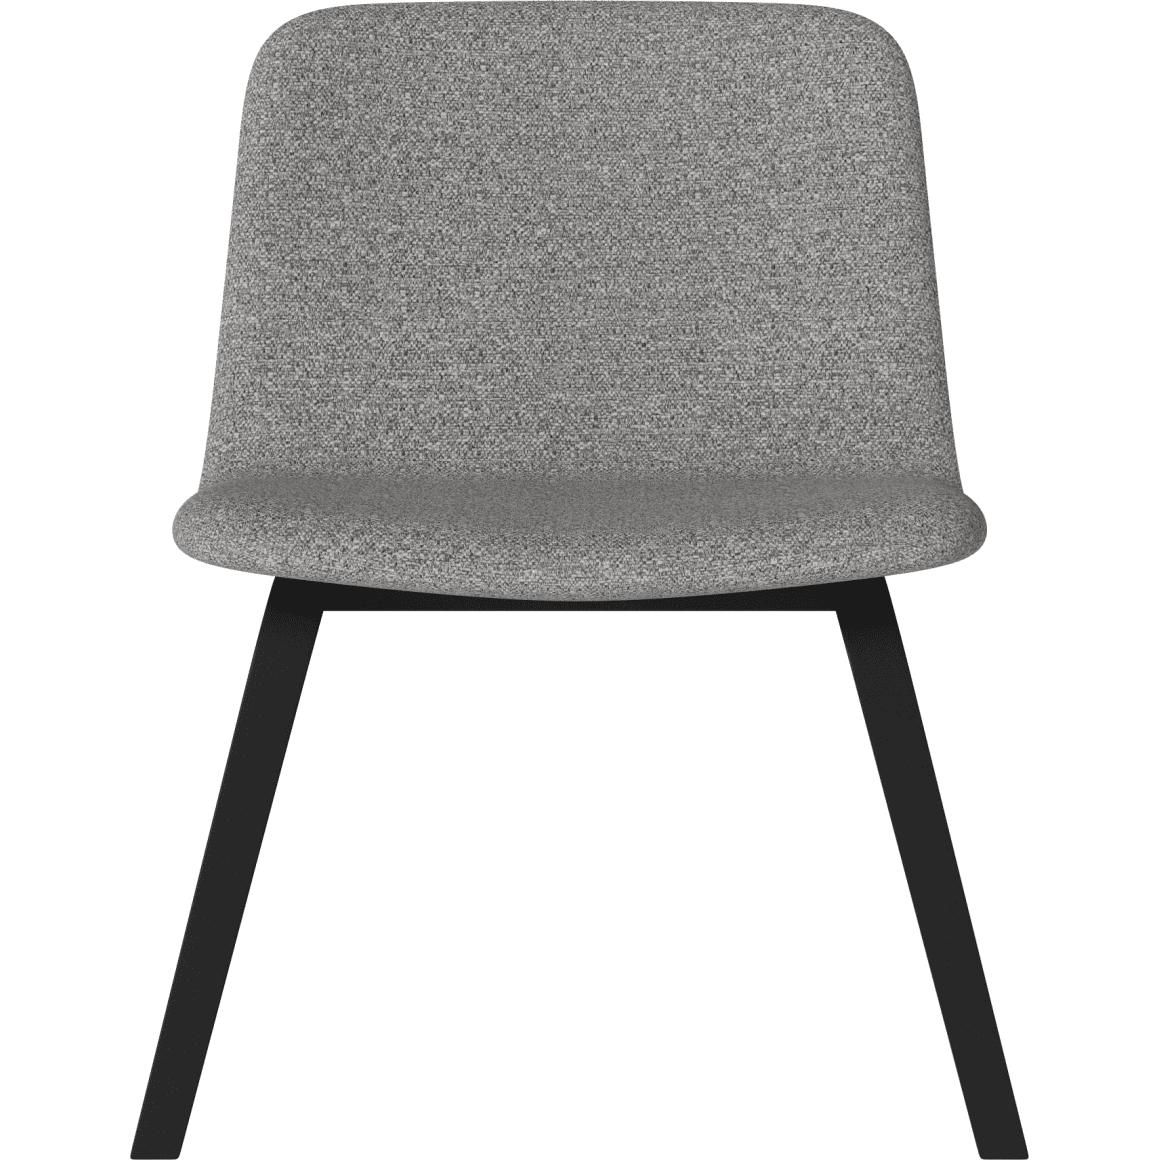 black_bolia_palm_upholstered_lounge_chair_innoconcept_karpitozott_szek